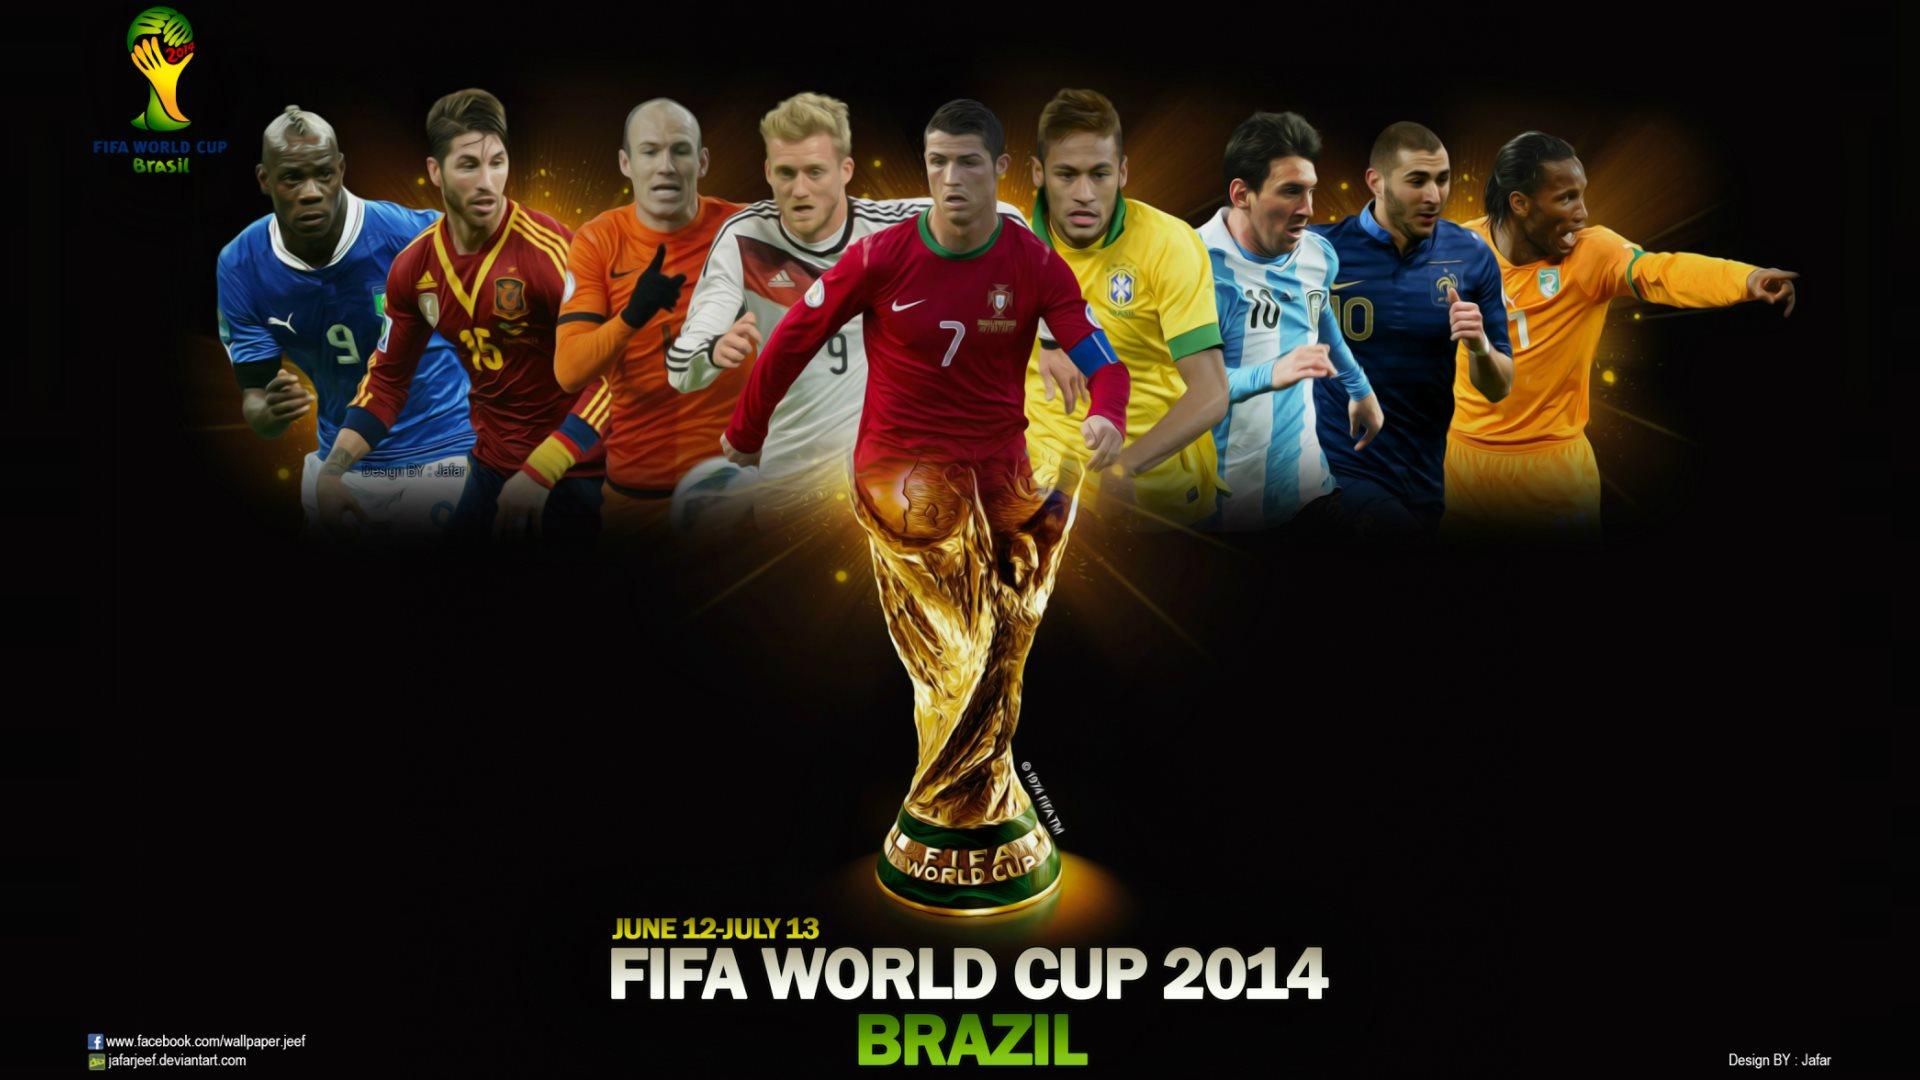 Brazil 2014 World Cup Players